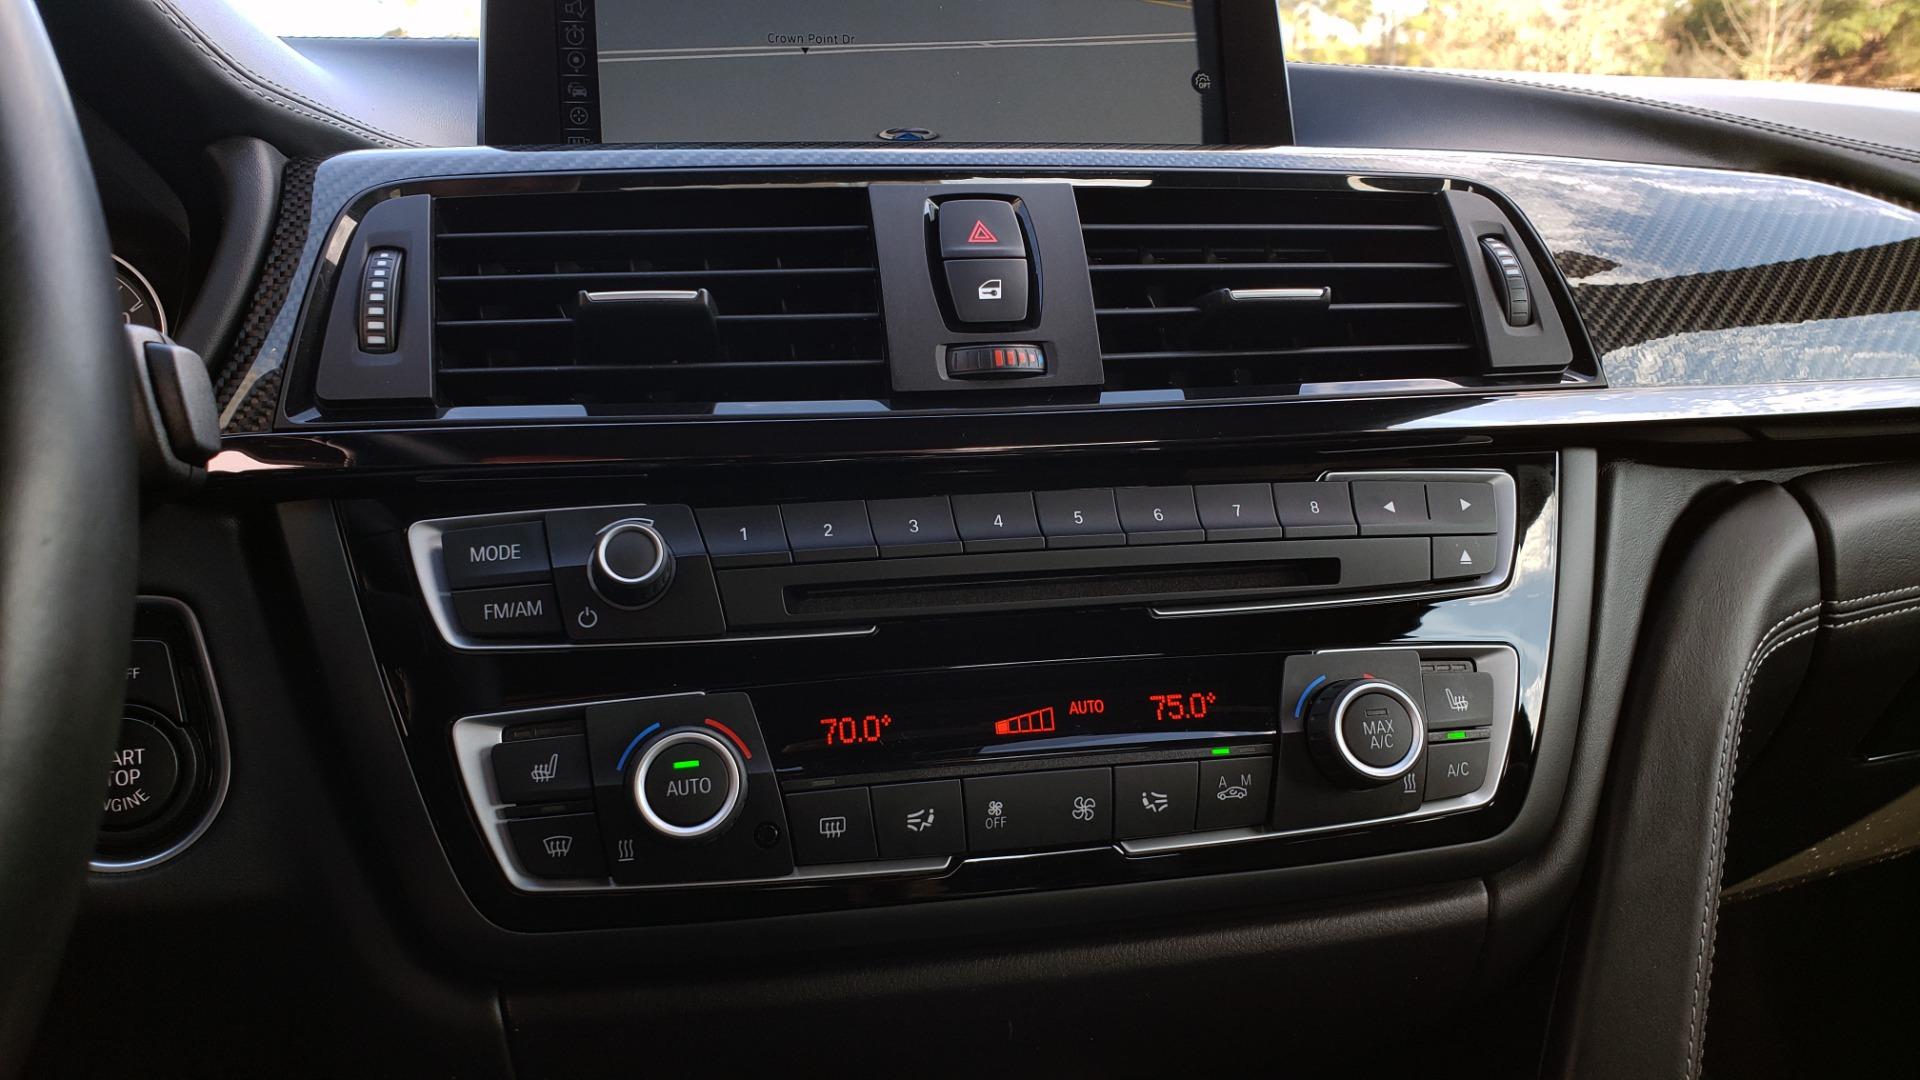 Used 2015 BMW M4 COUPE / EXEC PKG / DRVR ASST PLUS / LIGHTING / M-SUSPENSION for sale Sold at Formula Imports in Charlotte NC 28227 56